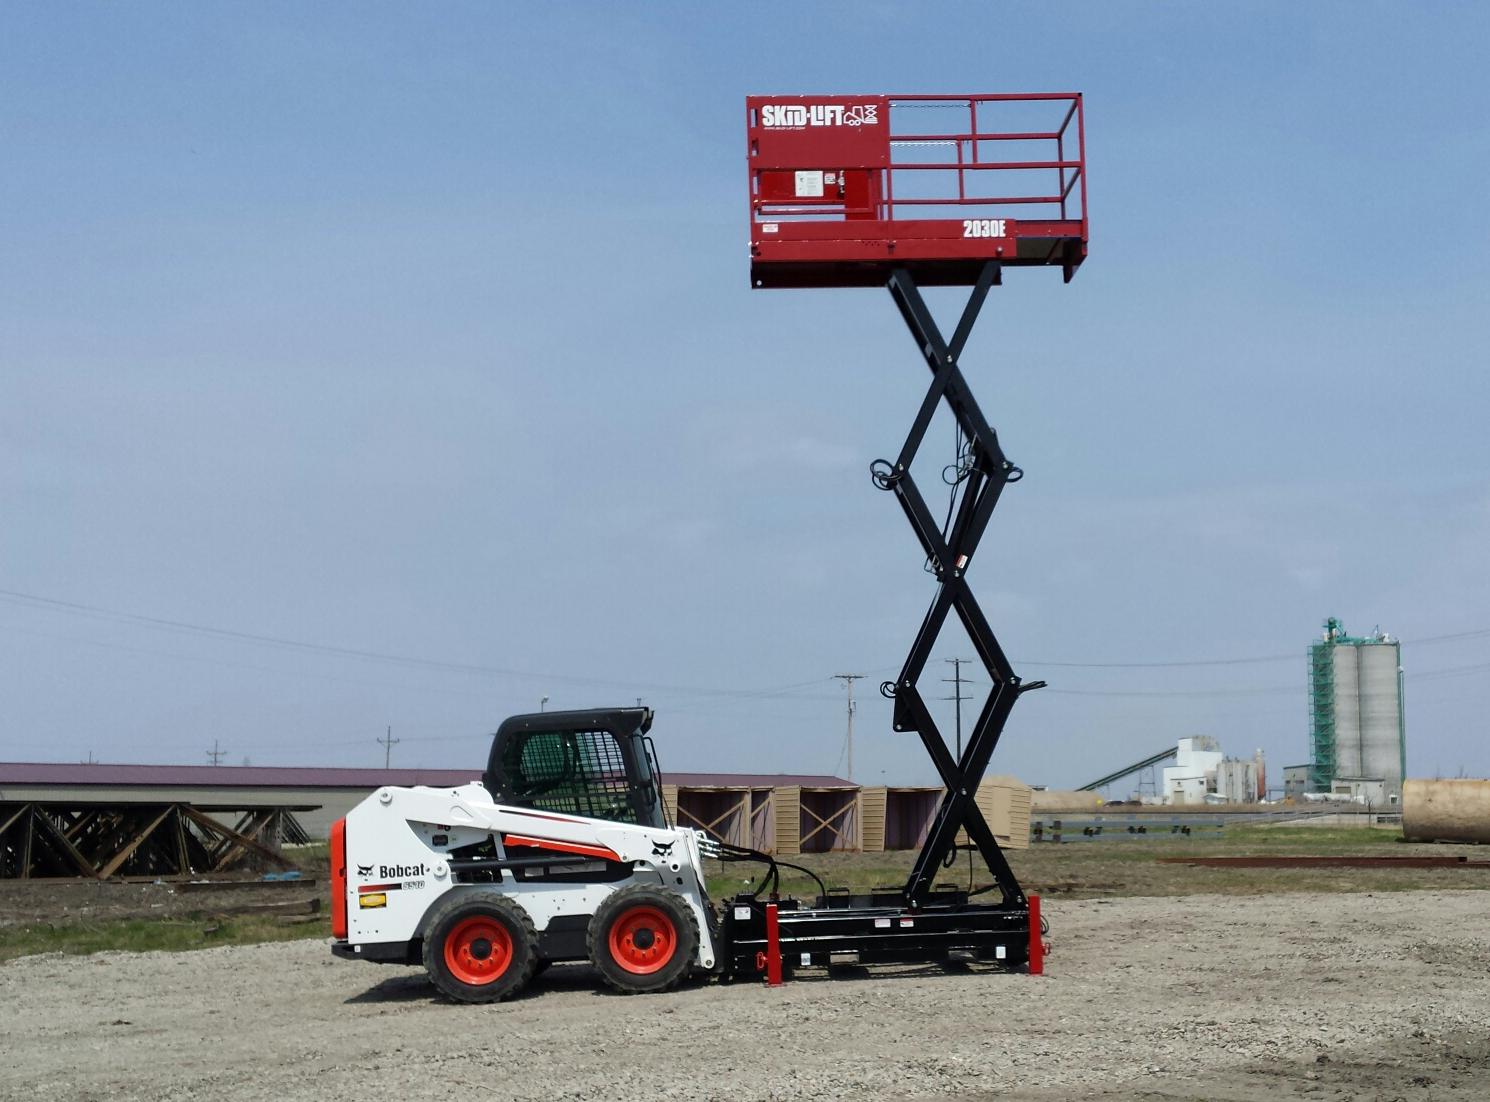 Tractor Bucket Hoist : Skid lift begins production of scissor attachments